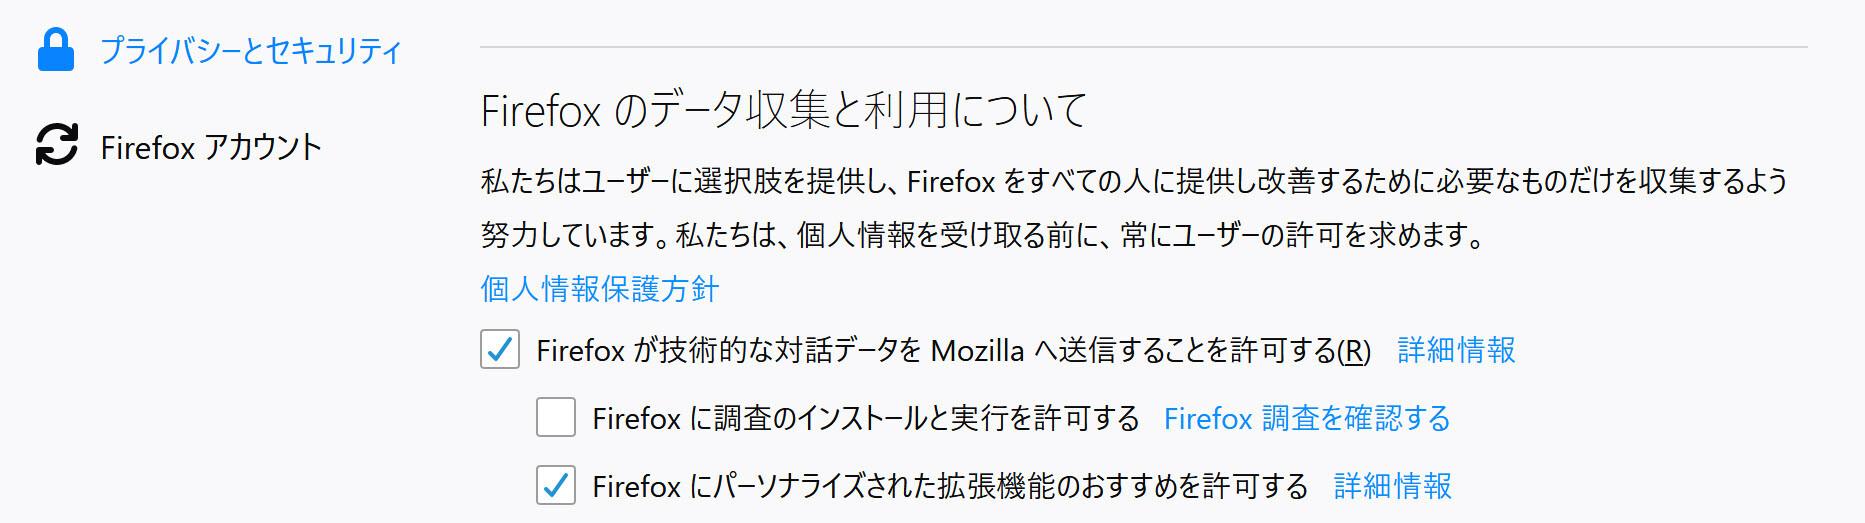 Firefox アドオン対策